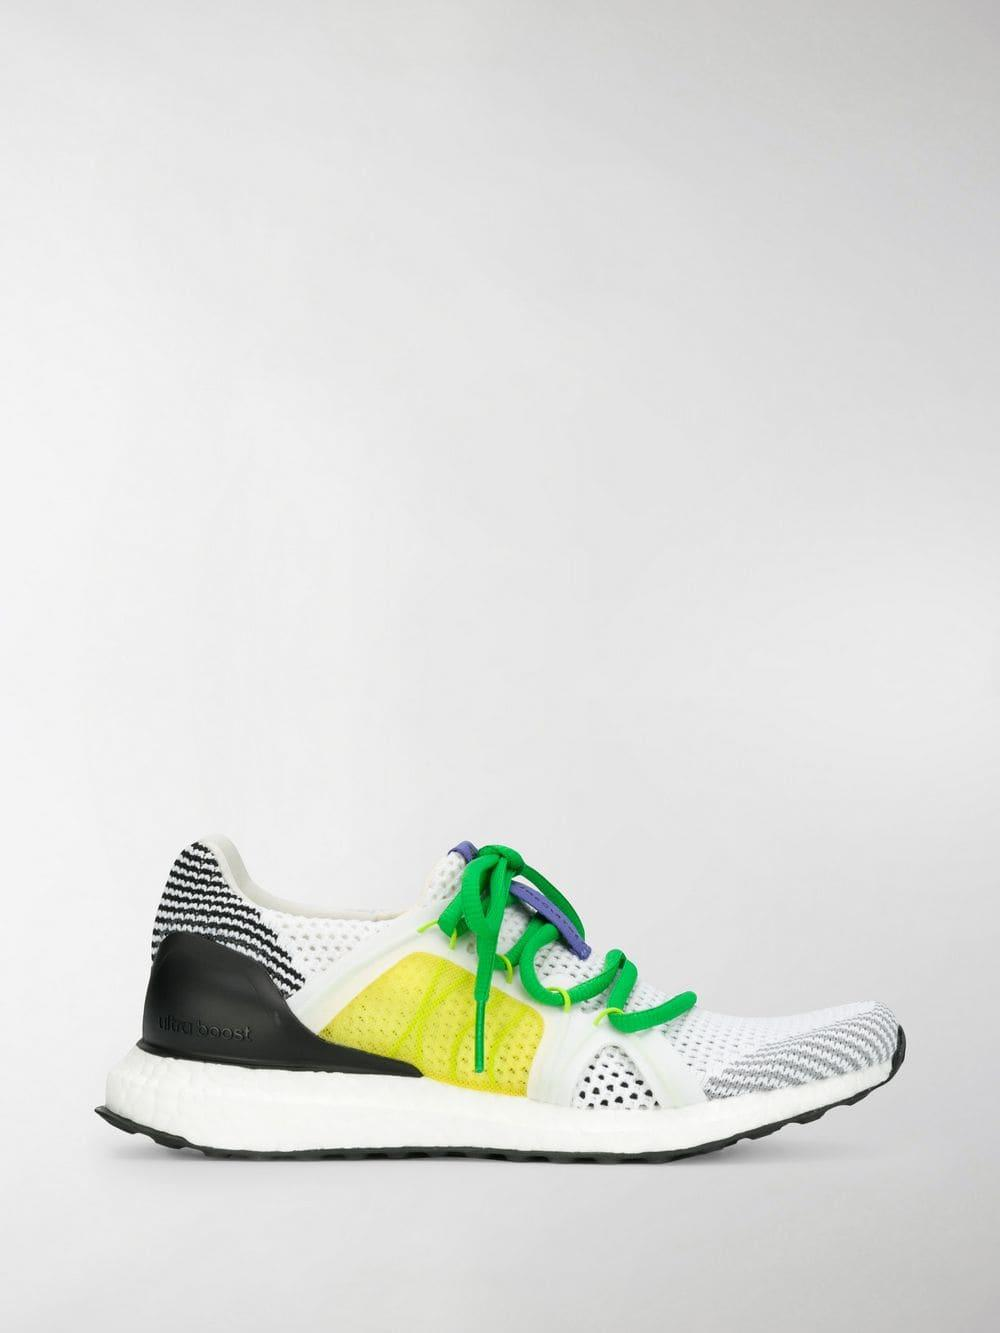 8f9aef8b51c Lyst - adidas By Stella McCartney Ultraboost Sneakers in White